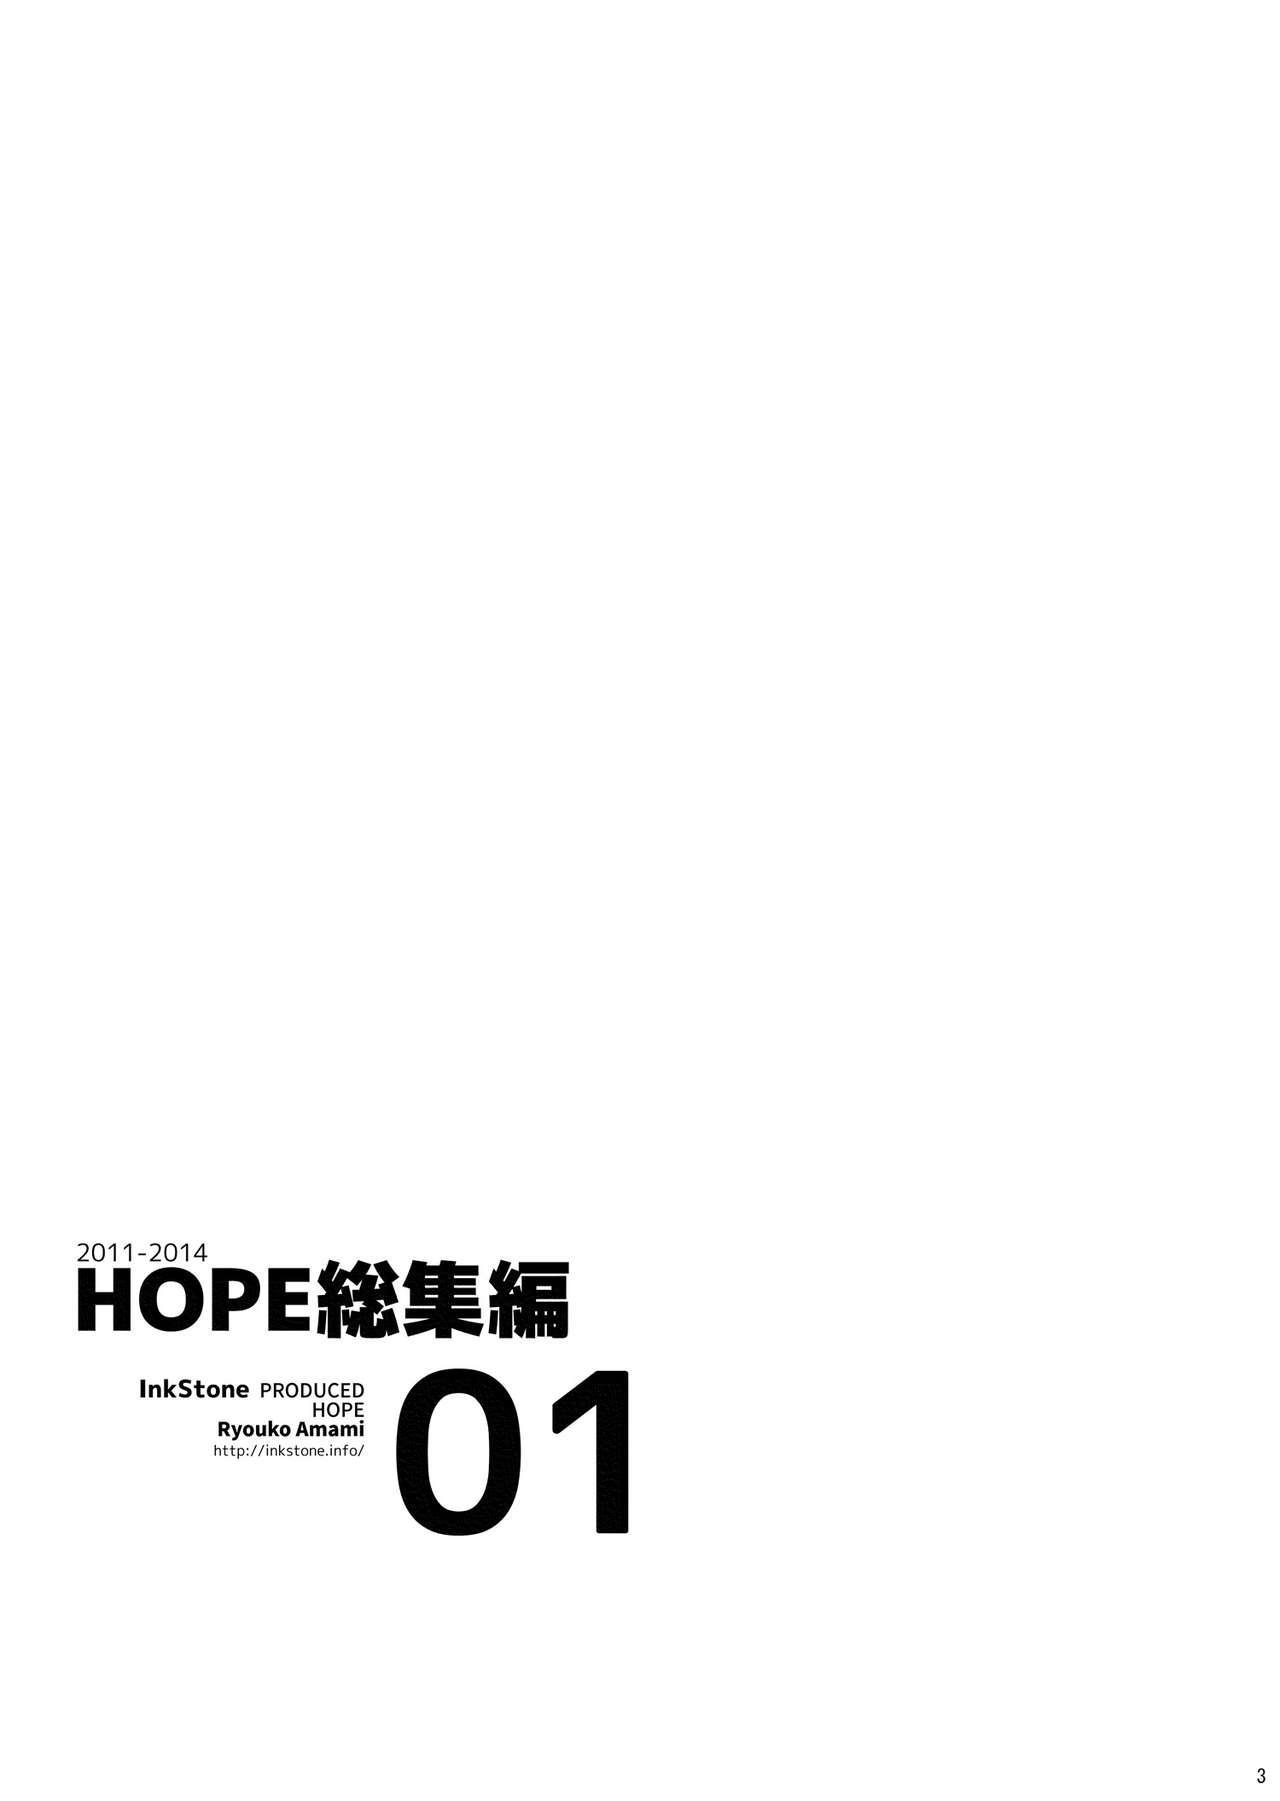 HOPE Soushuuhen01 14